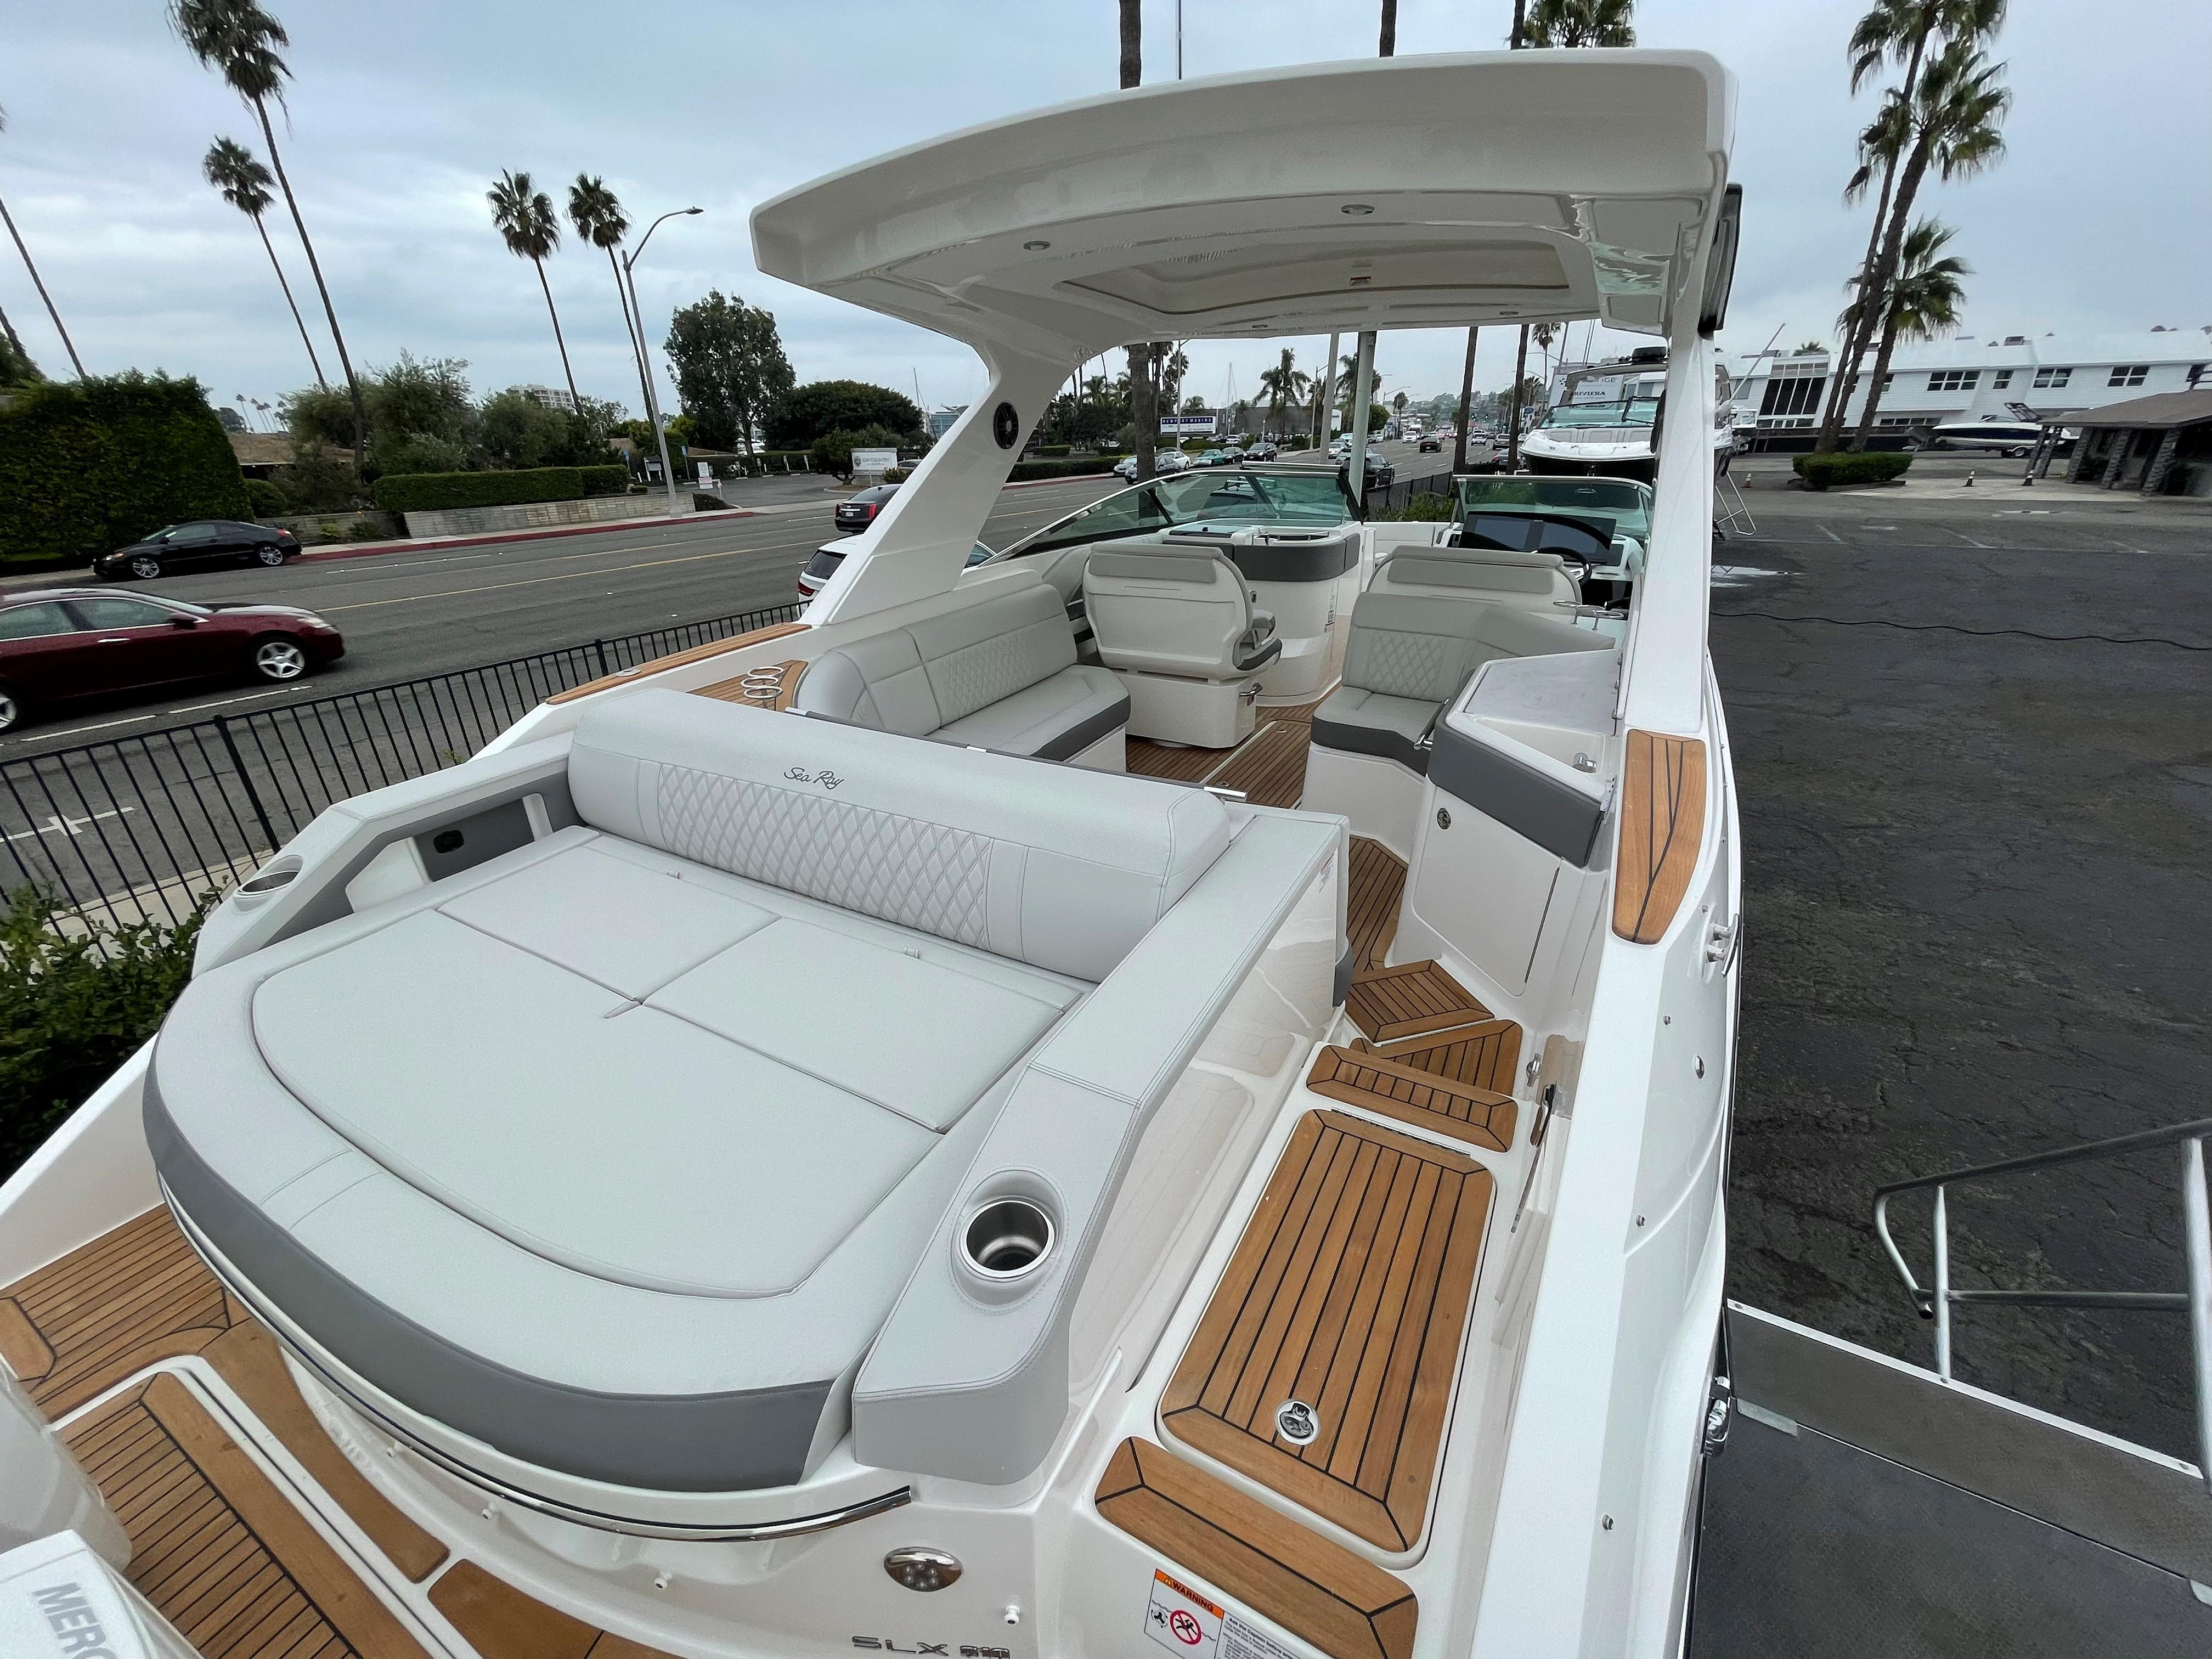 2022 Sea Ray 310 SLX OB #S1338G inventory image at Sun Country Coastal in Newport Beach